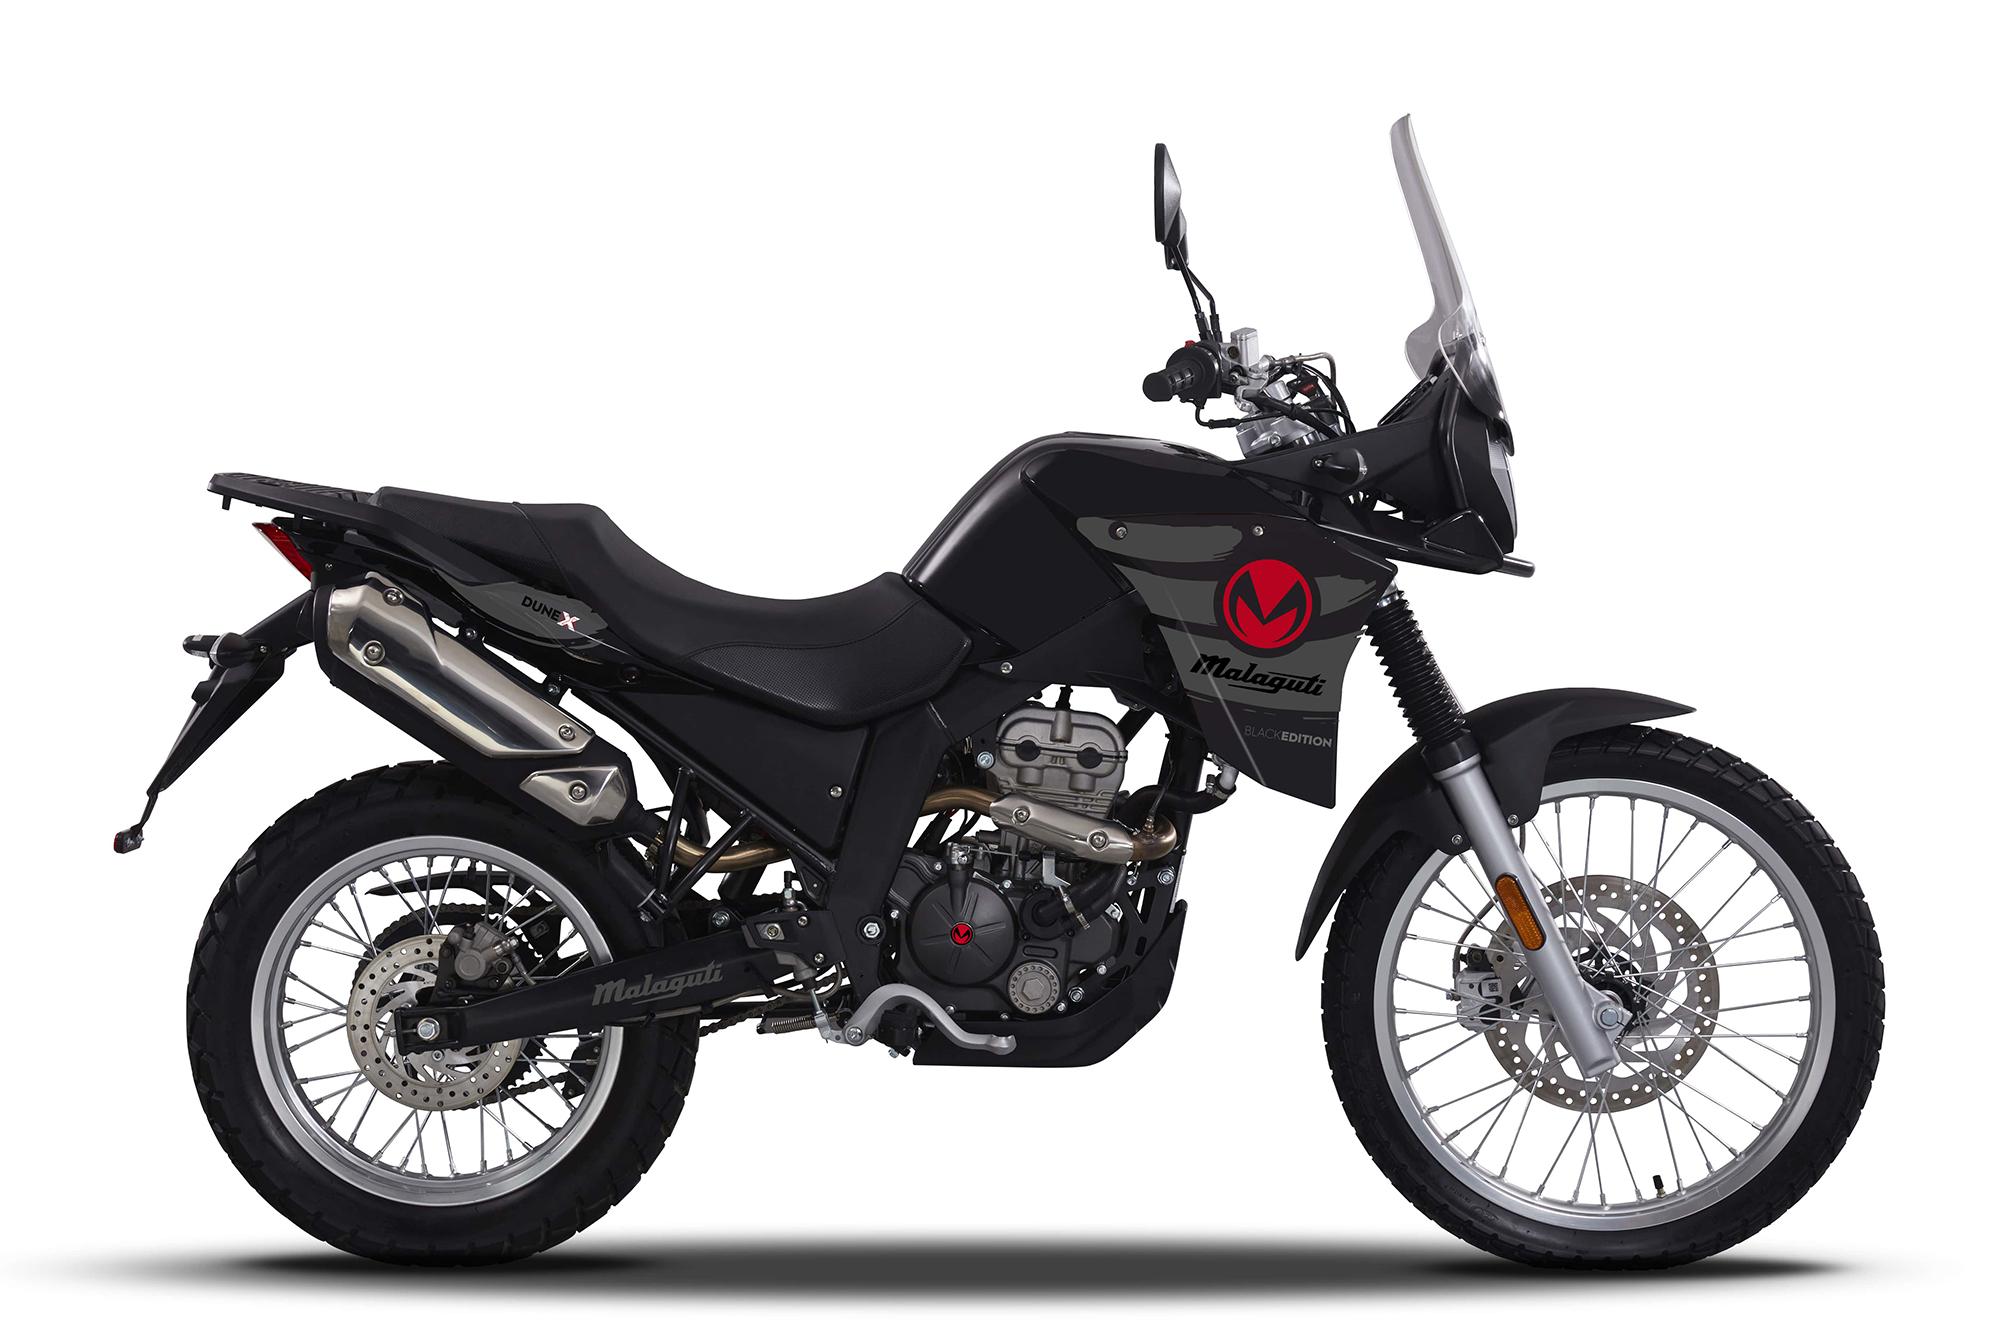 Malaguti Ansbach, Nürnberg - Malaguti Motorräder | 125 Ccm Black Edition Adventure